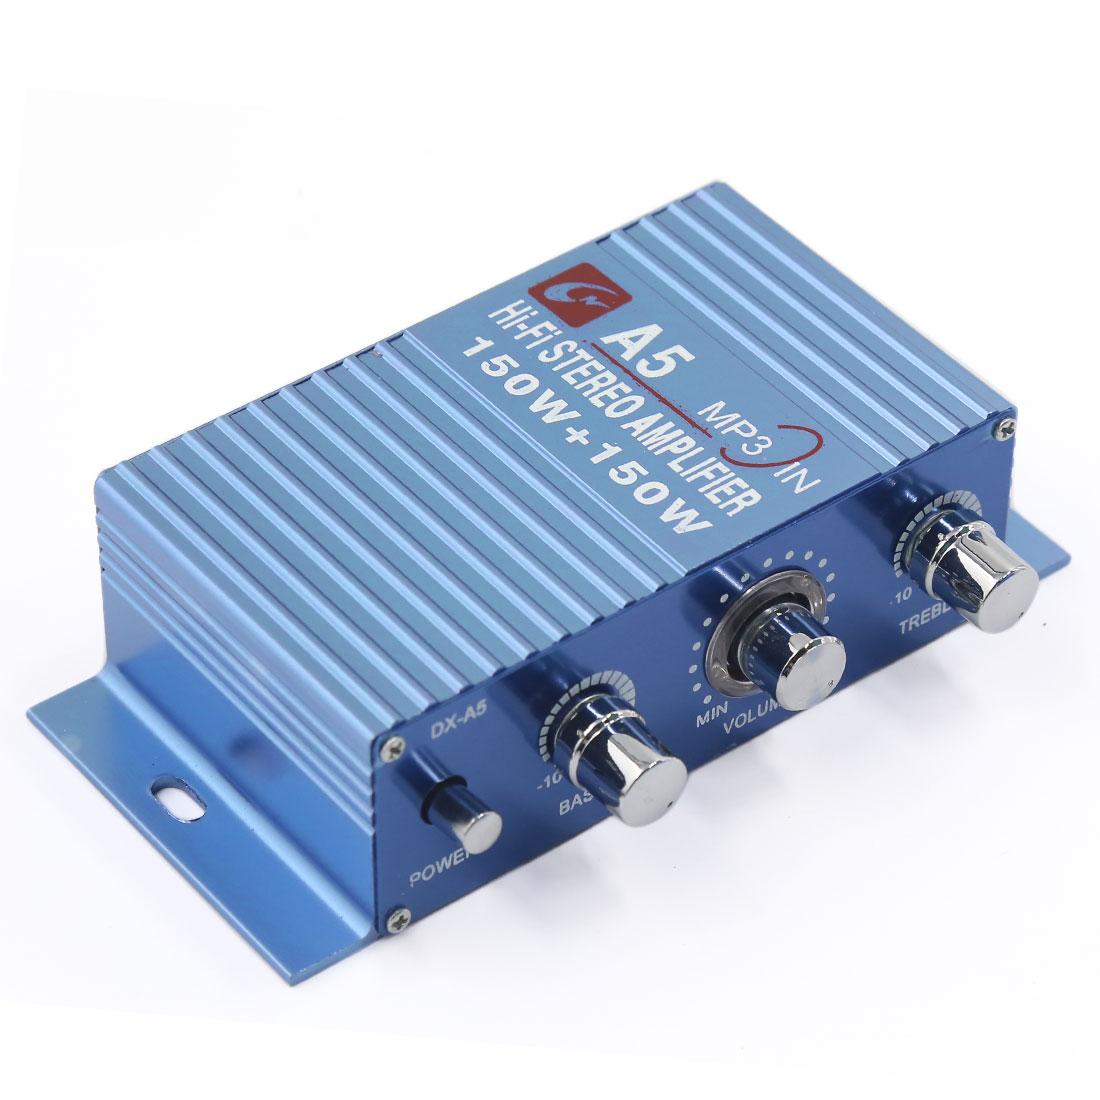 150W + 150W Blue Aluminum Alloy Mini Hi-Fi Car Stereo Audio Power Amplifier 85dB